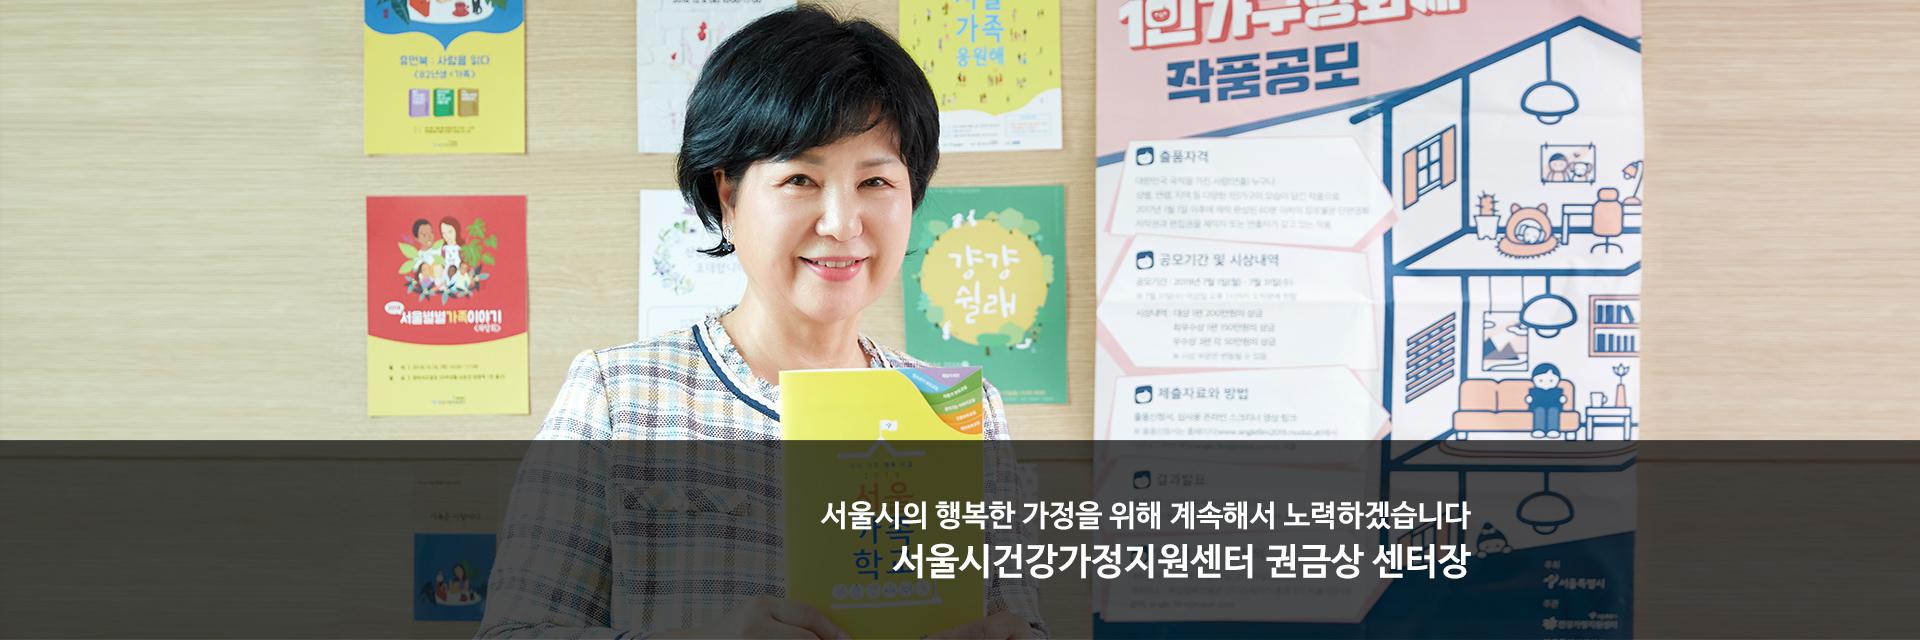 SH가 만난 사람: 서울특별시 건강가정지원센터 권금상 센터장